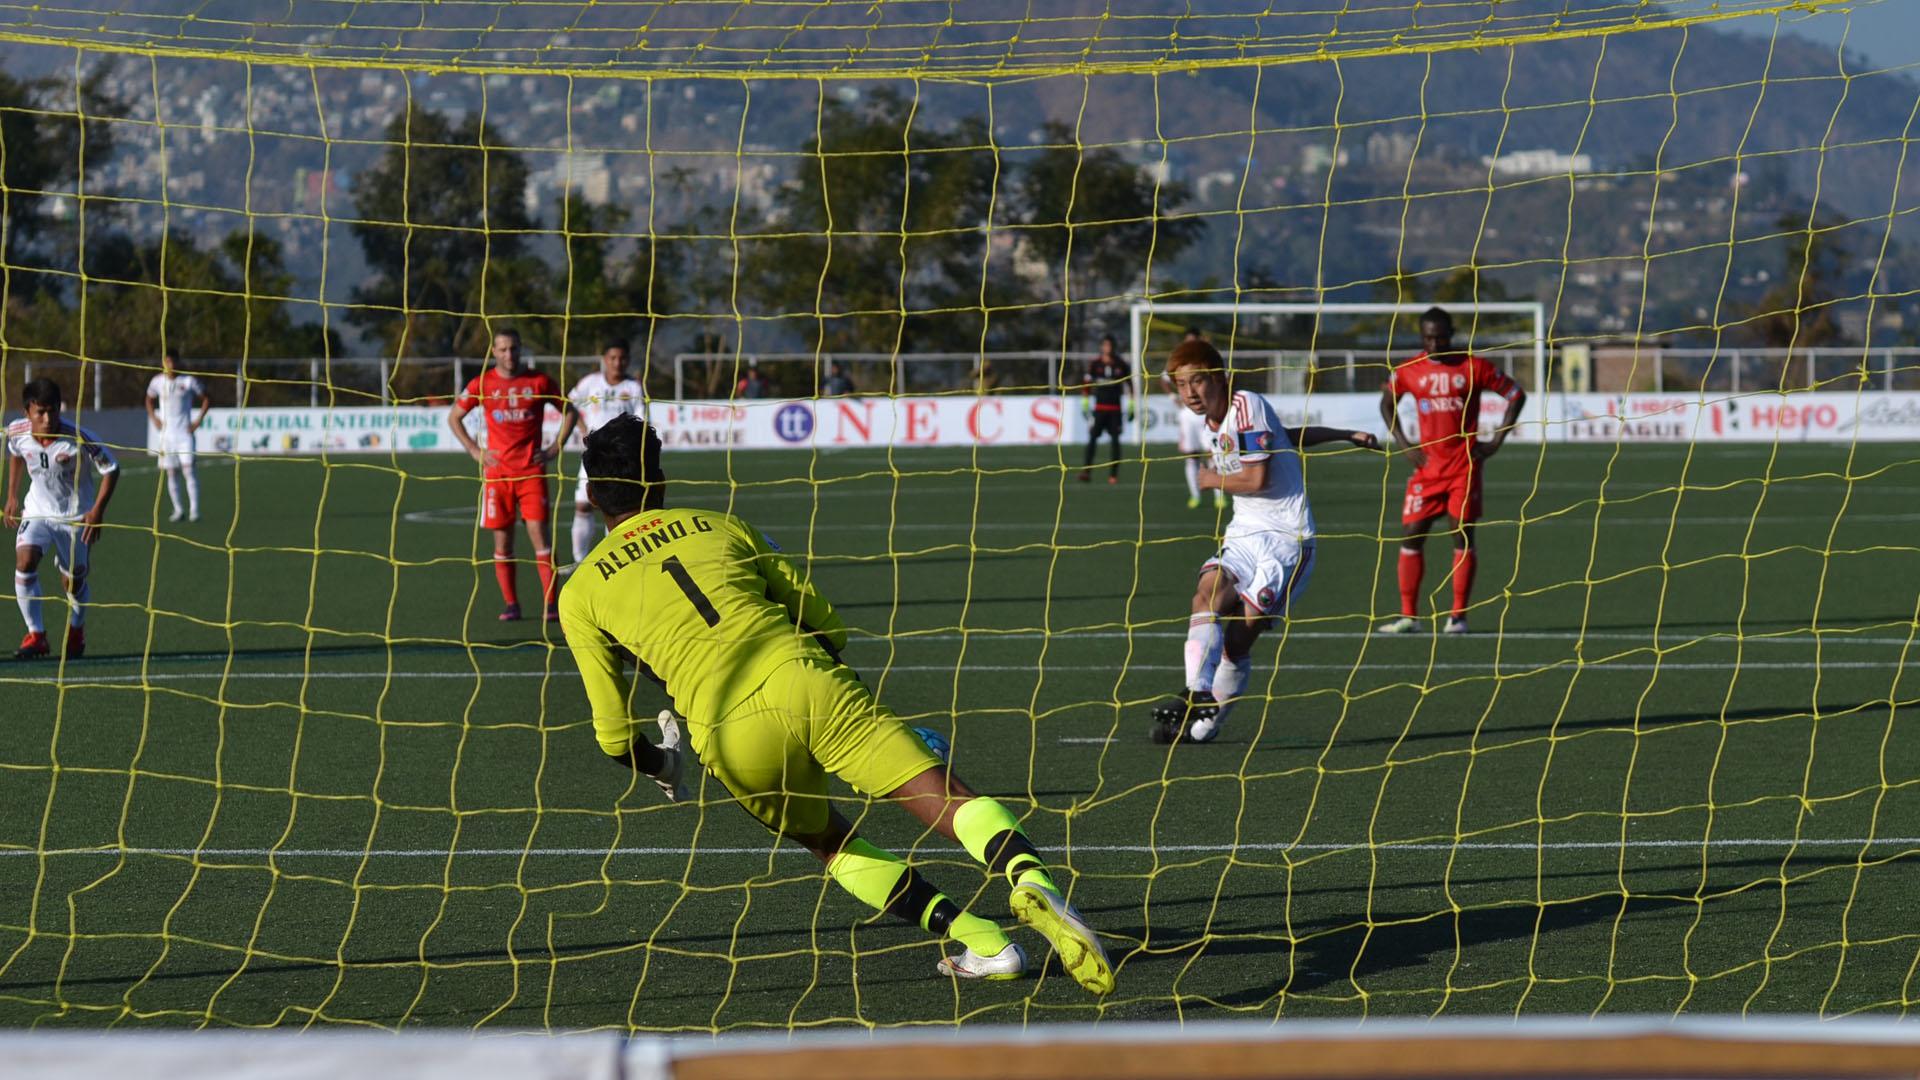 Yuta Kinowaki Aizawl FC Shillong Lajong FC I-League 2017